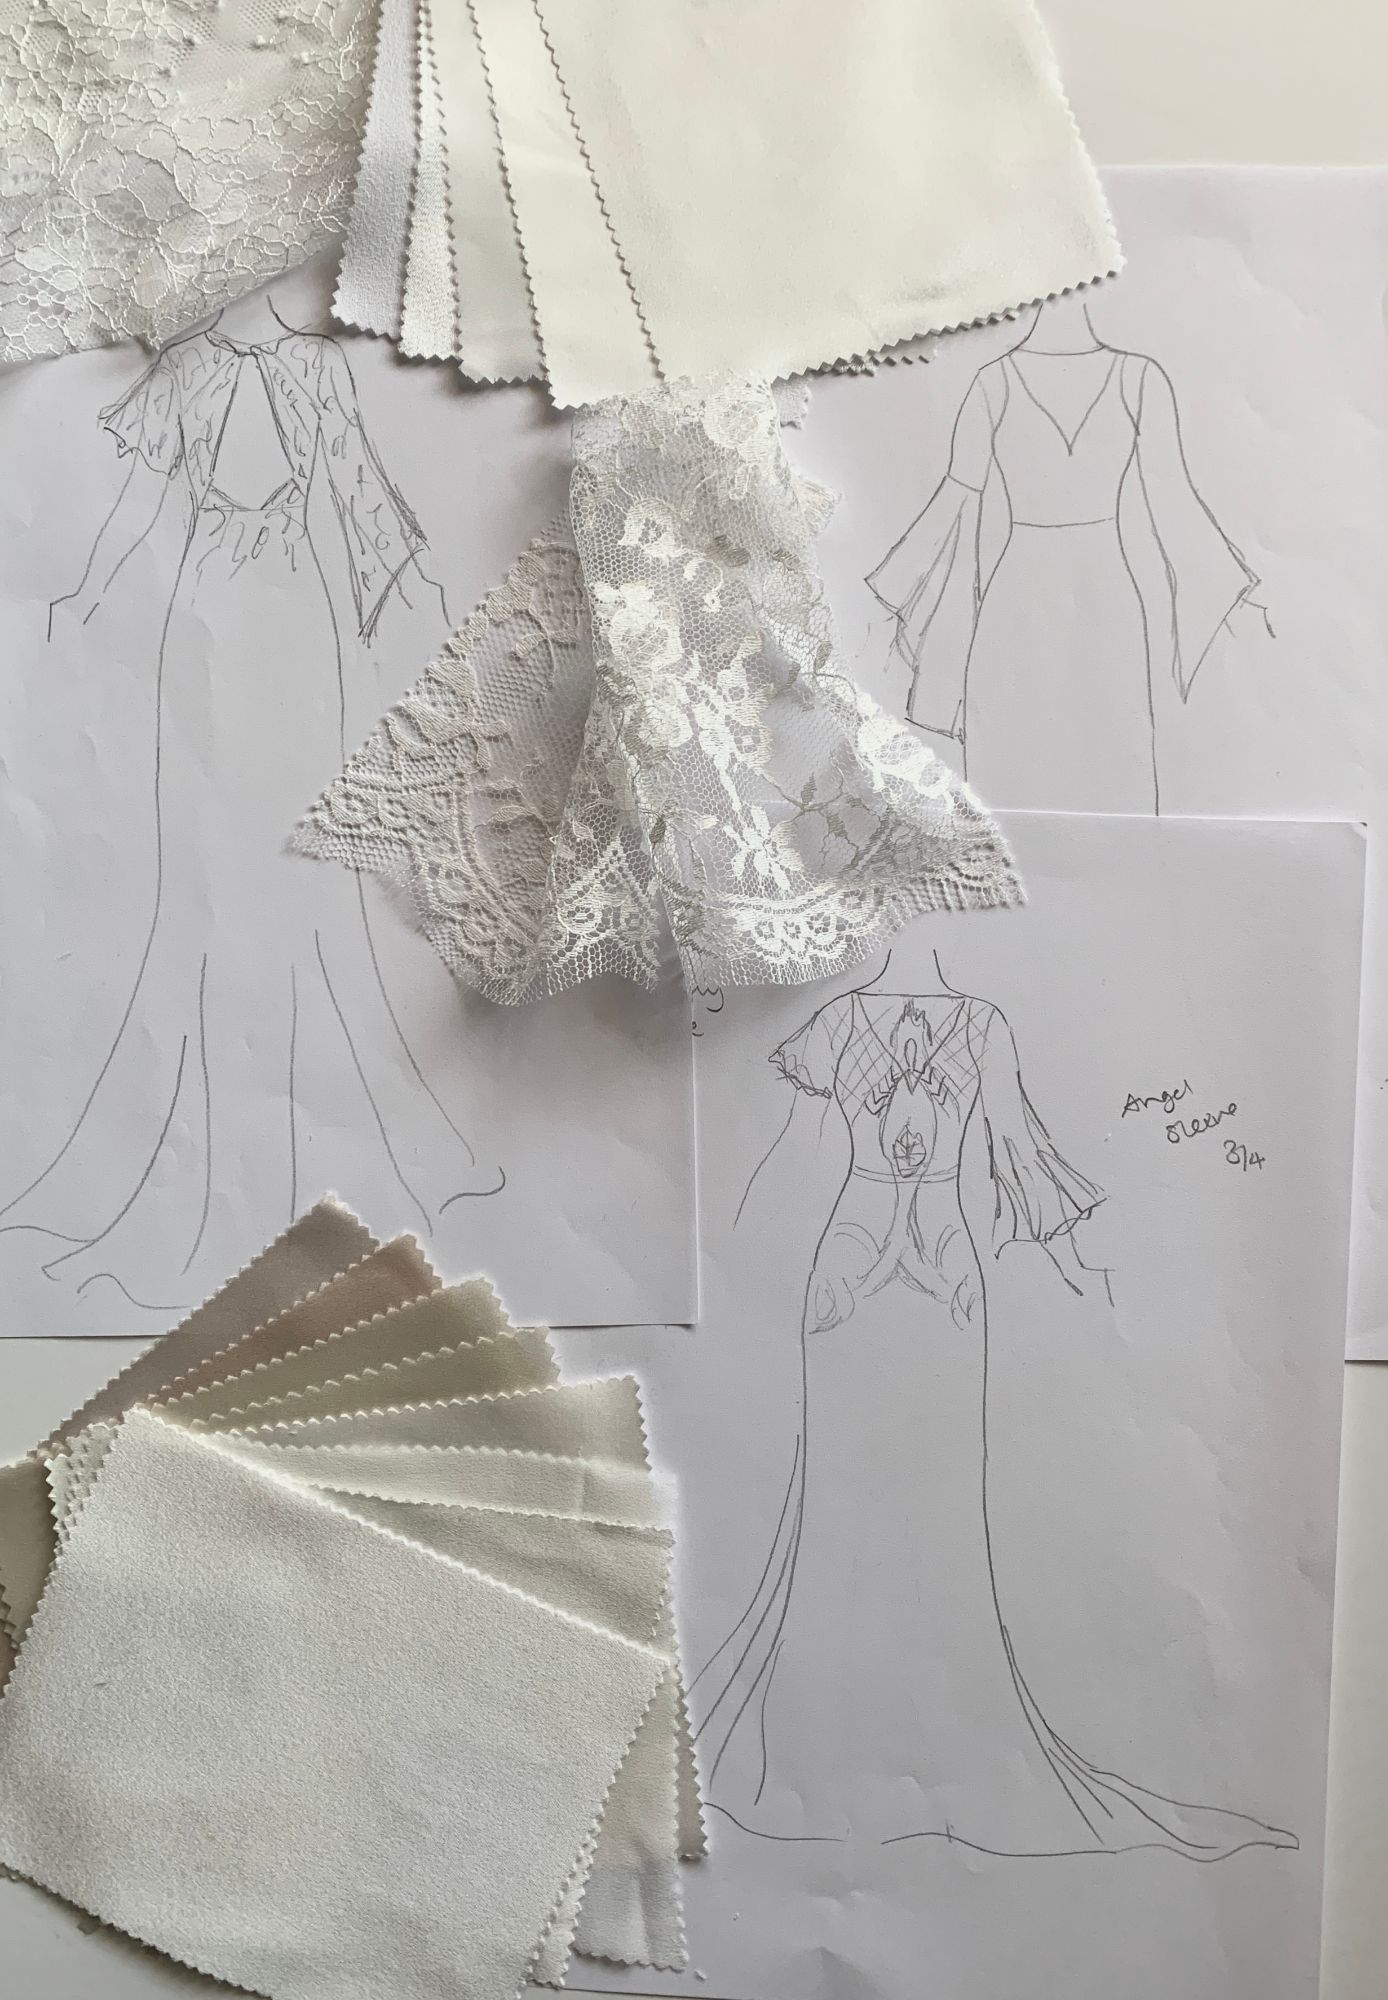 handmade bespoke wedding dress sketch